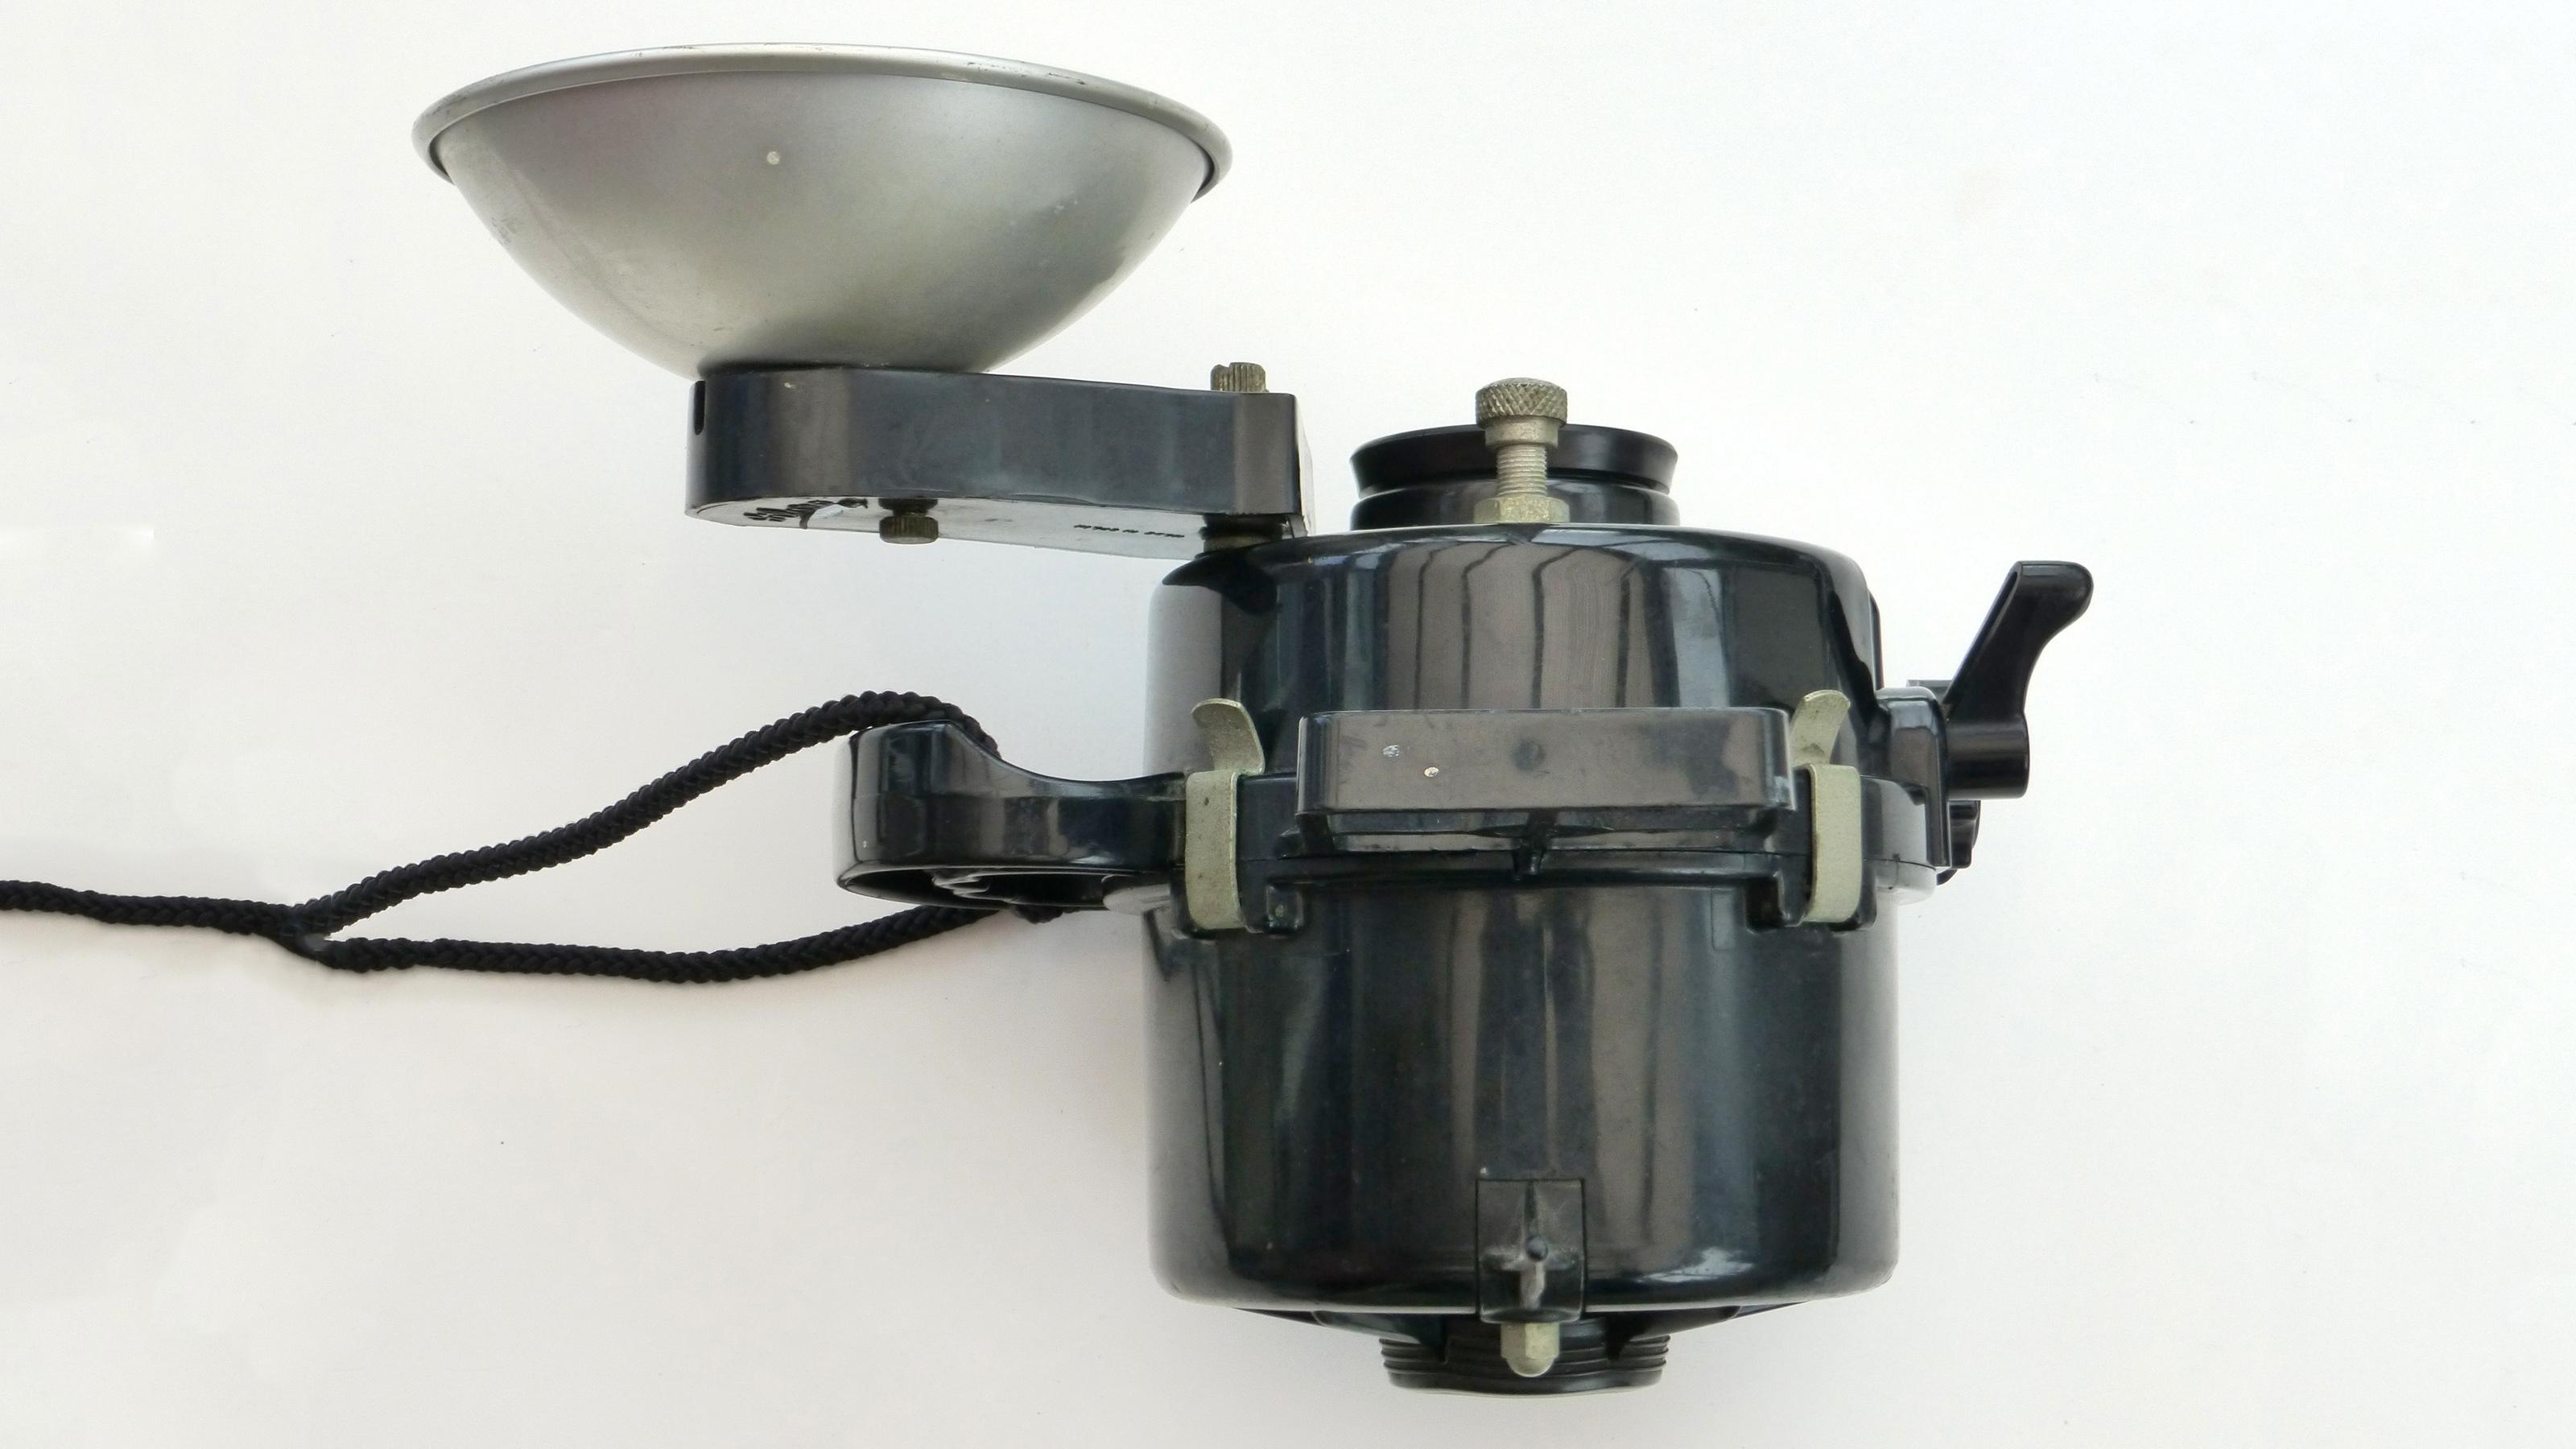 The top of the Nemrod Siluro underwater camera